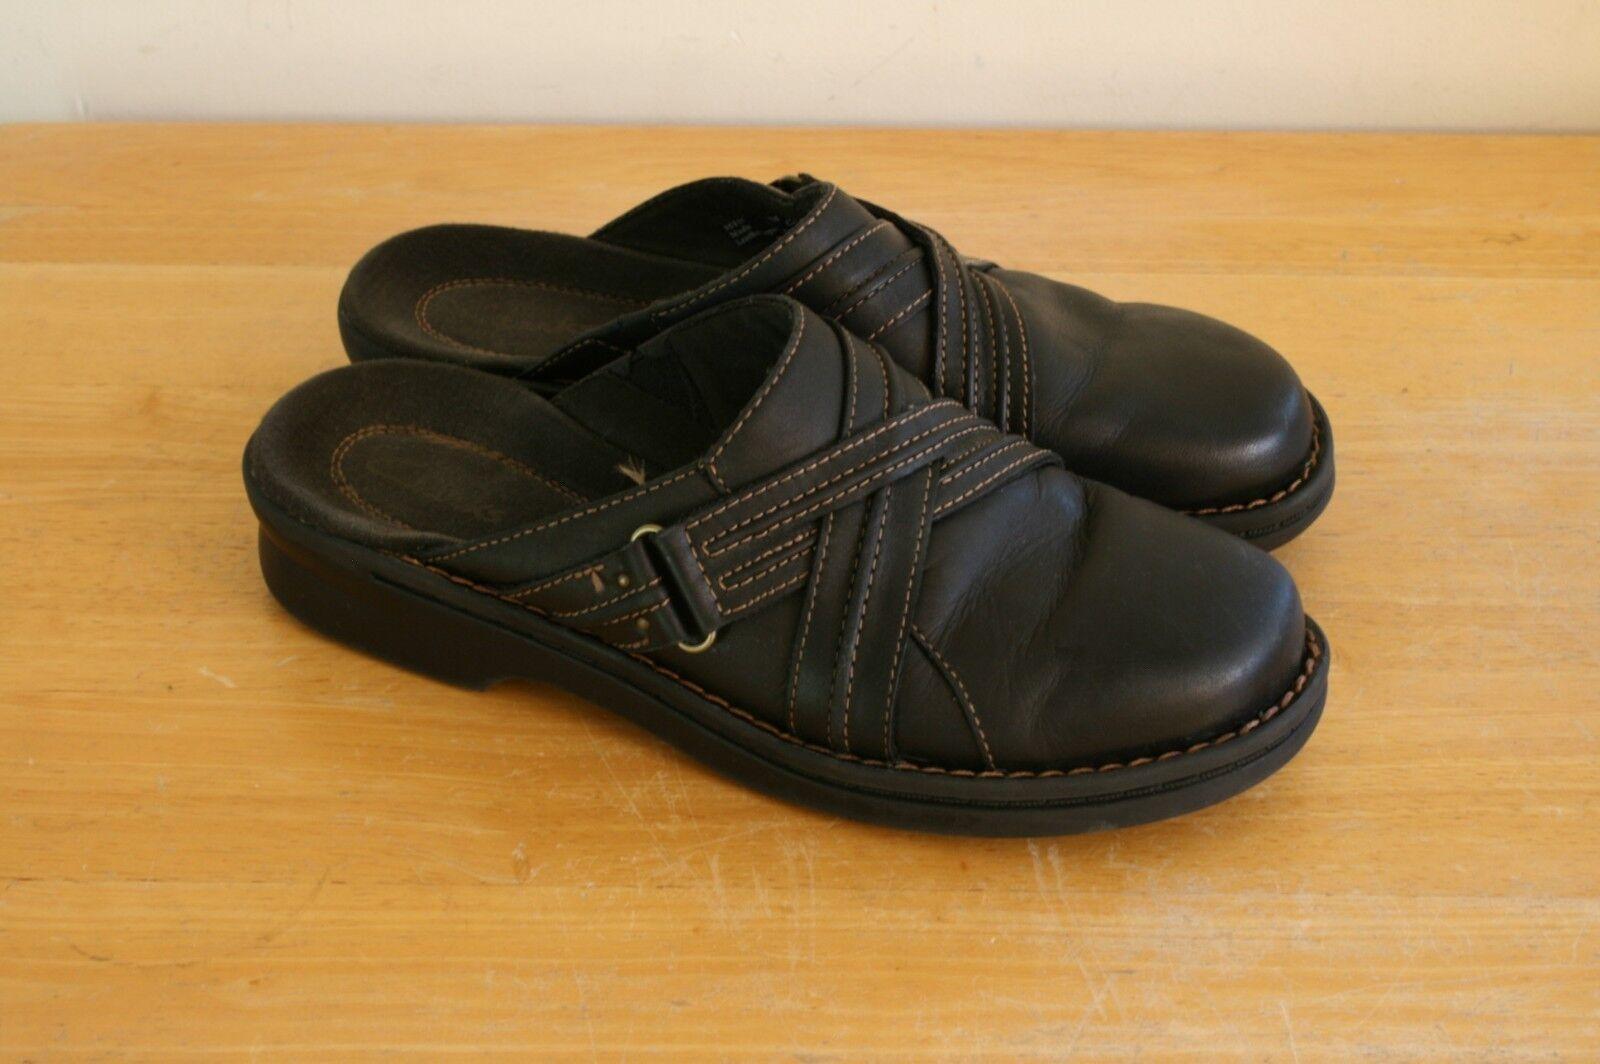 Clark's Women's Women's Clark's Brown Leather Mules Clogs Slip-On Slides Size 7  35114 a5c85f